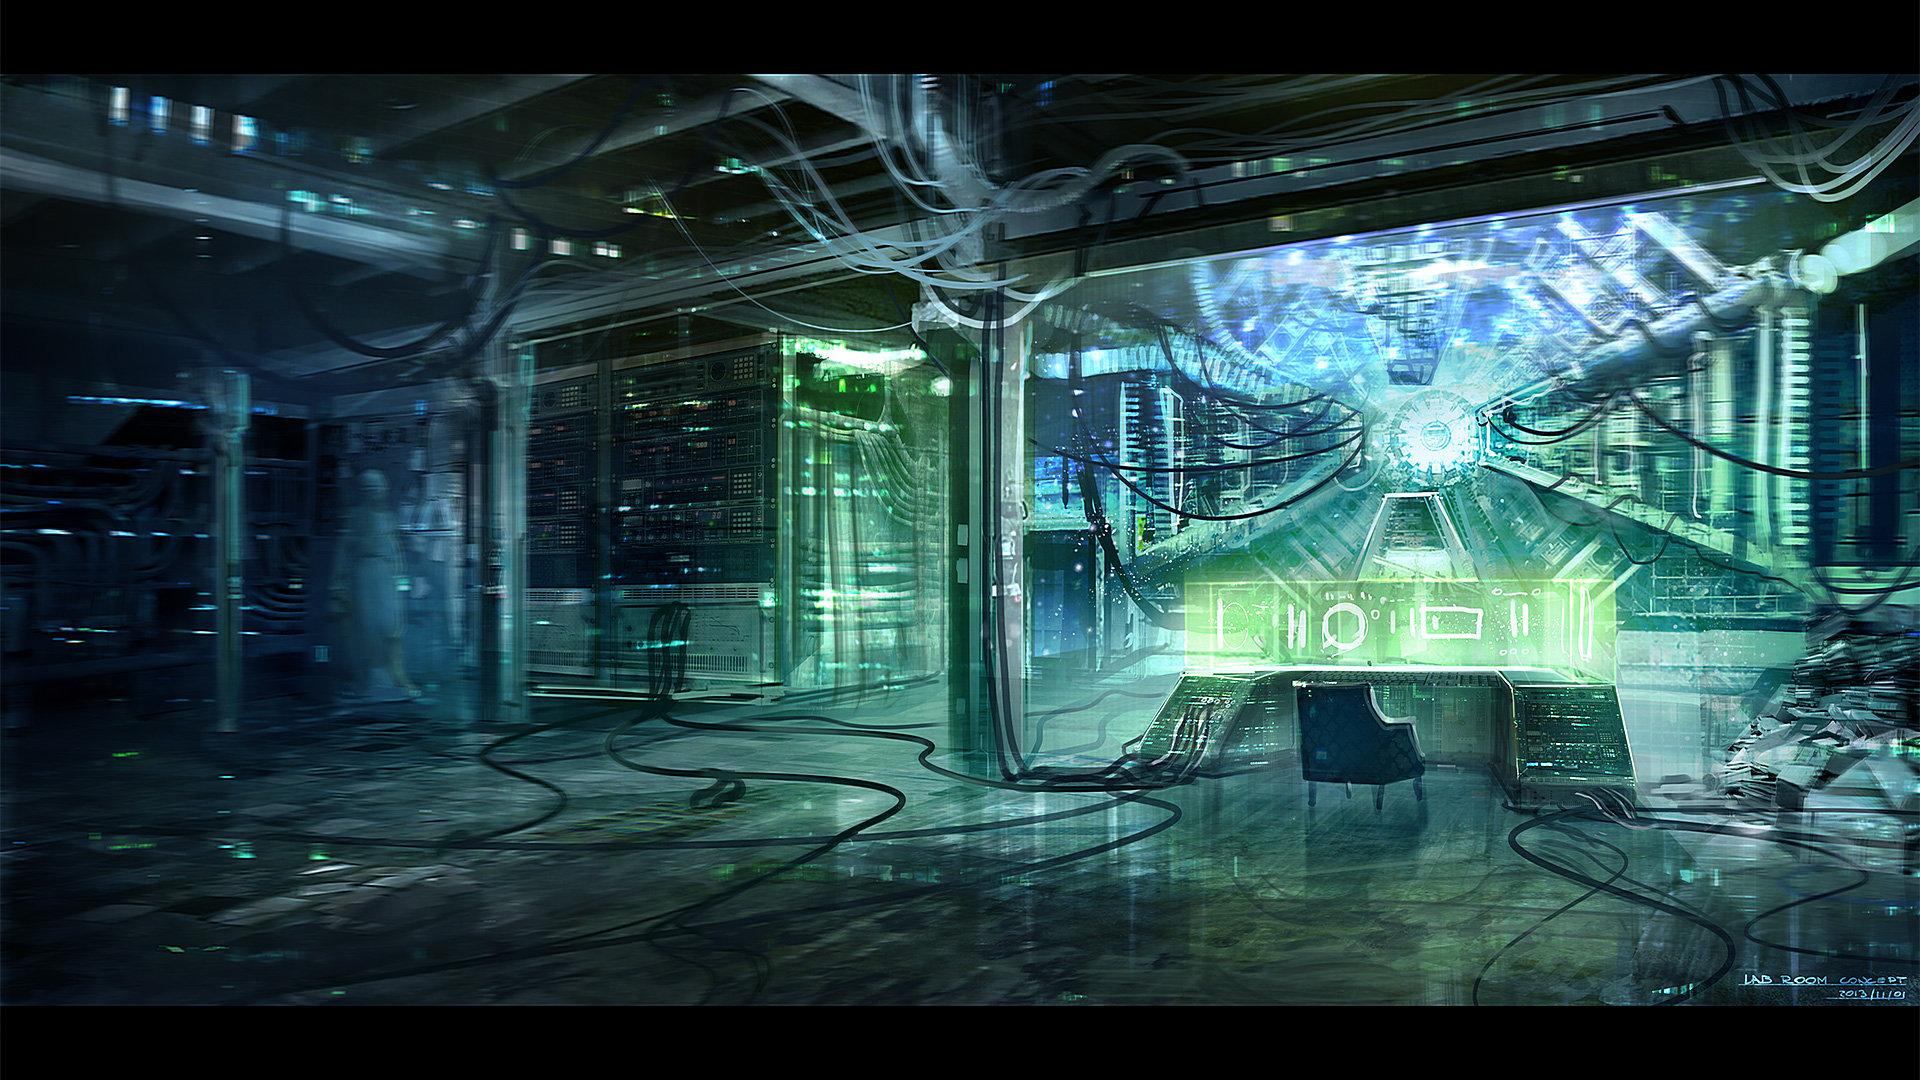 Mac Rebisz Another World Lab Concept